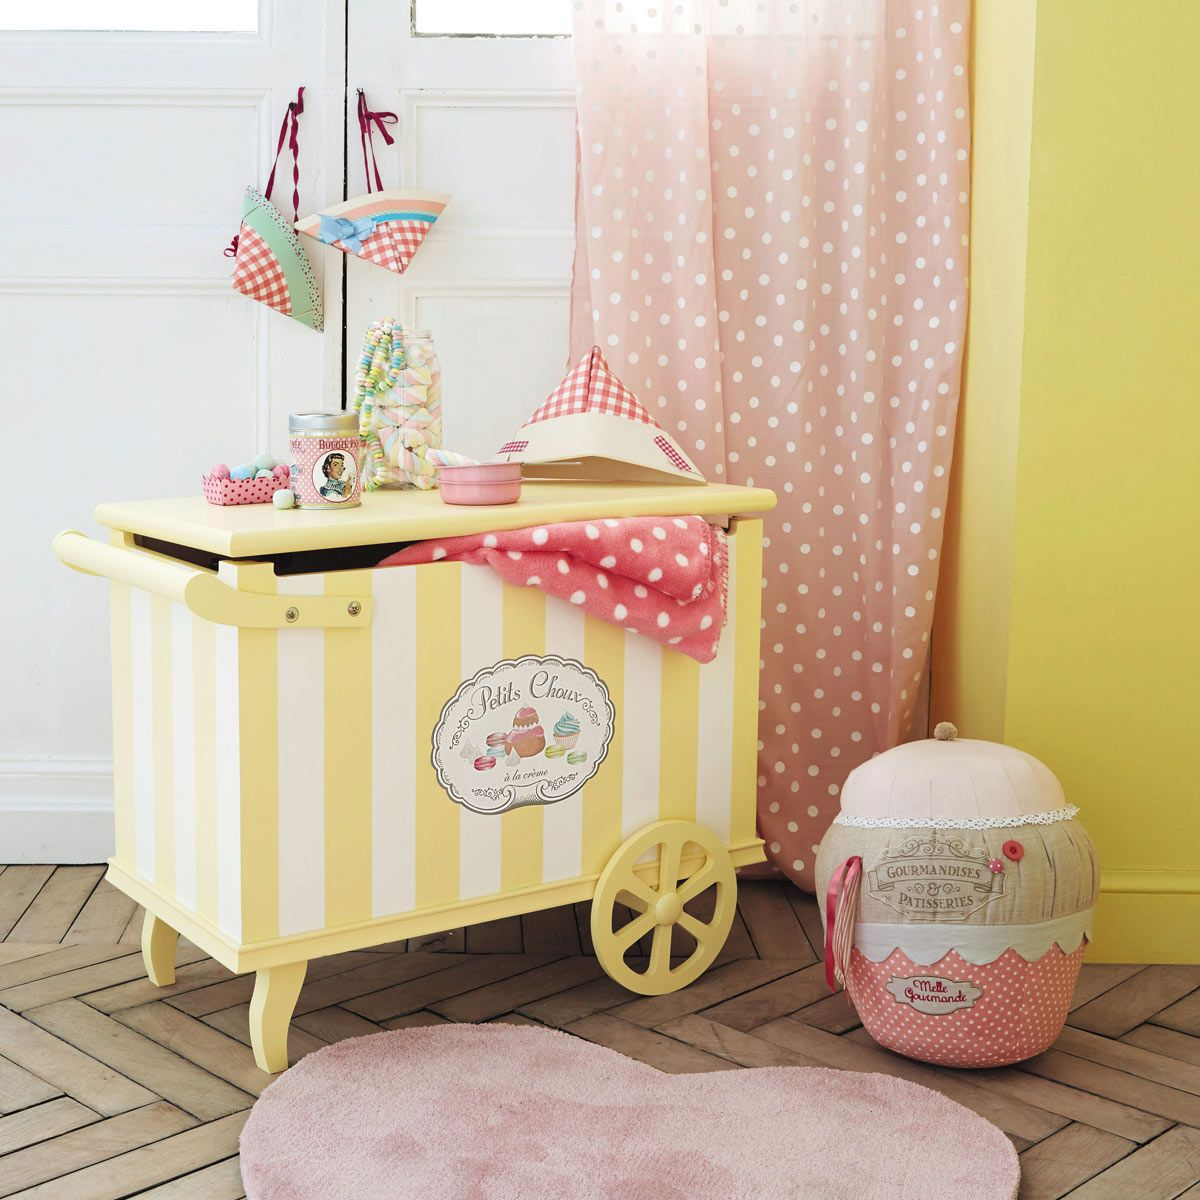 Inspiration Deco Gourmande Decoration Chambre Enfant Deco Chambre Bebe Chambre Enfant